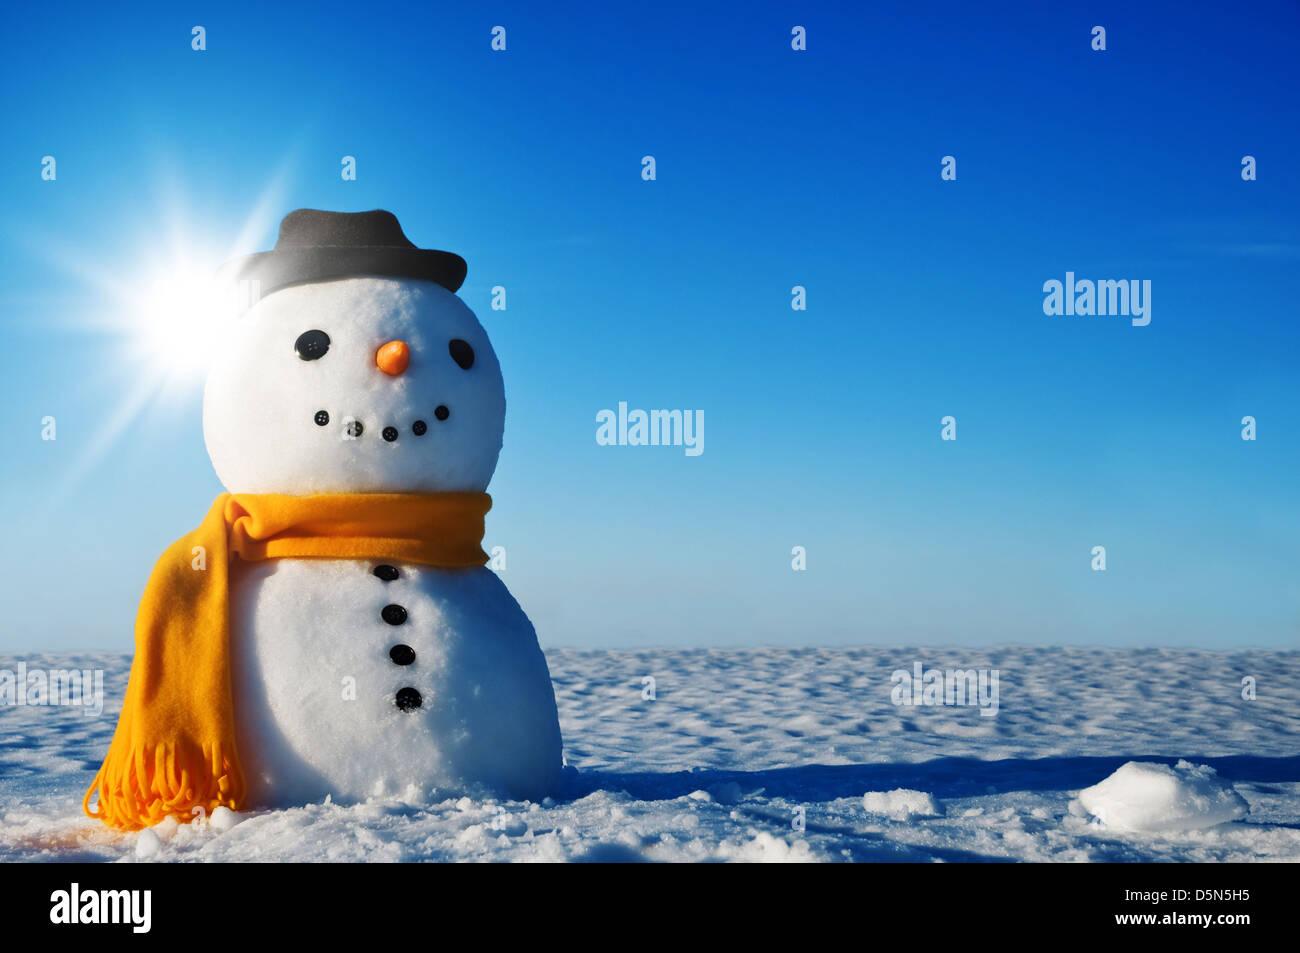 snowman on winter field - Stock Image